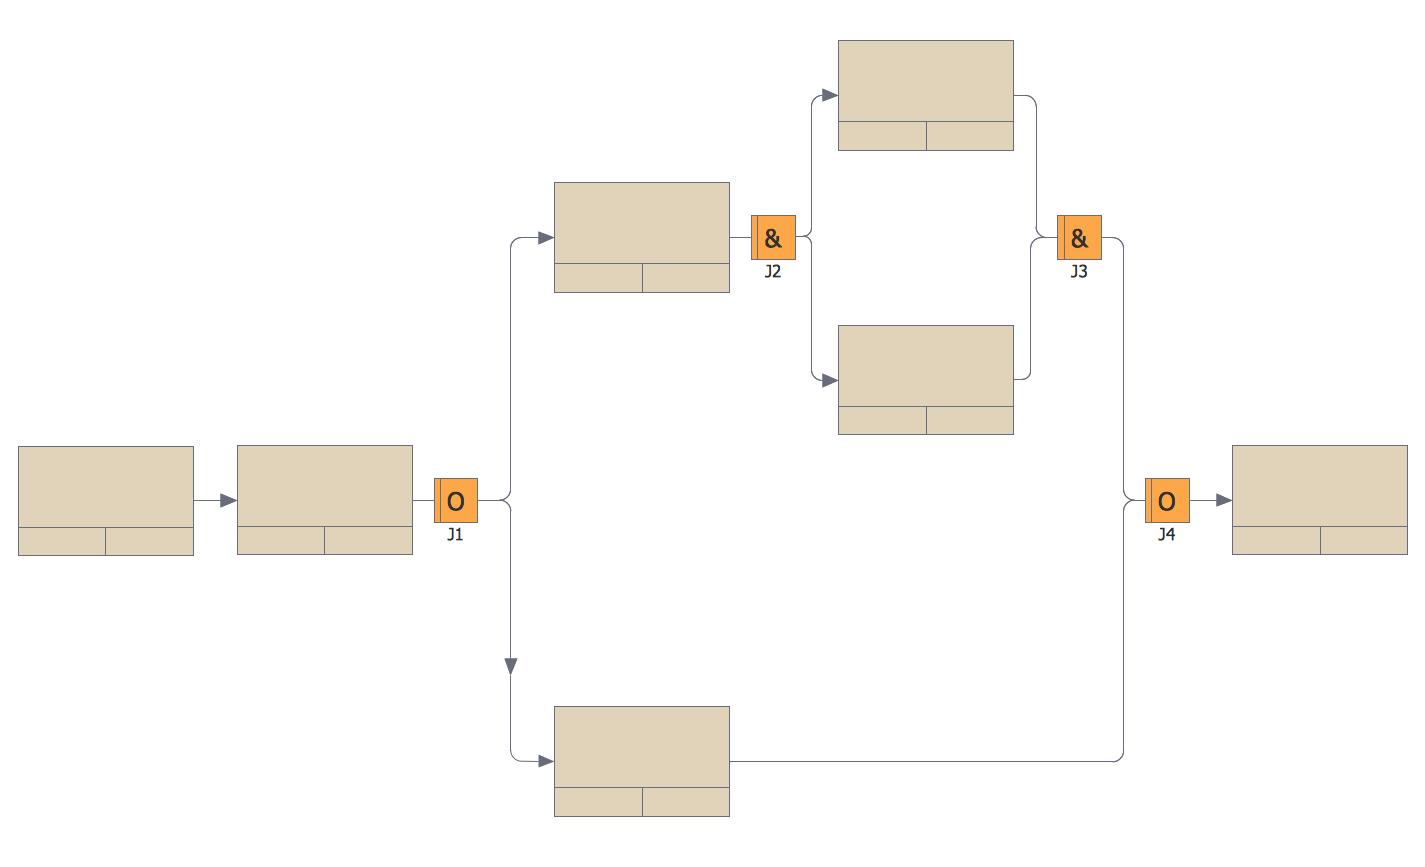 IDEF3 Process Schematic